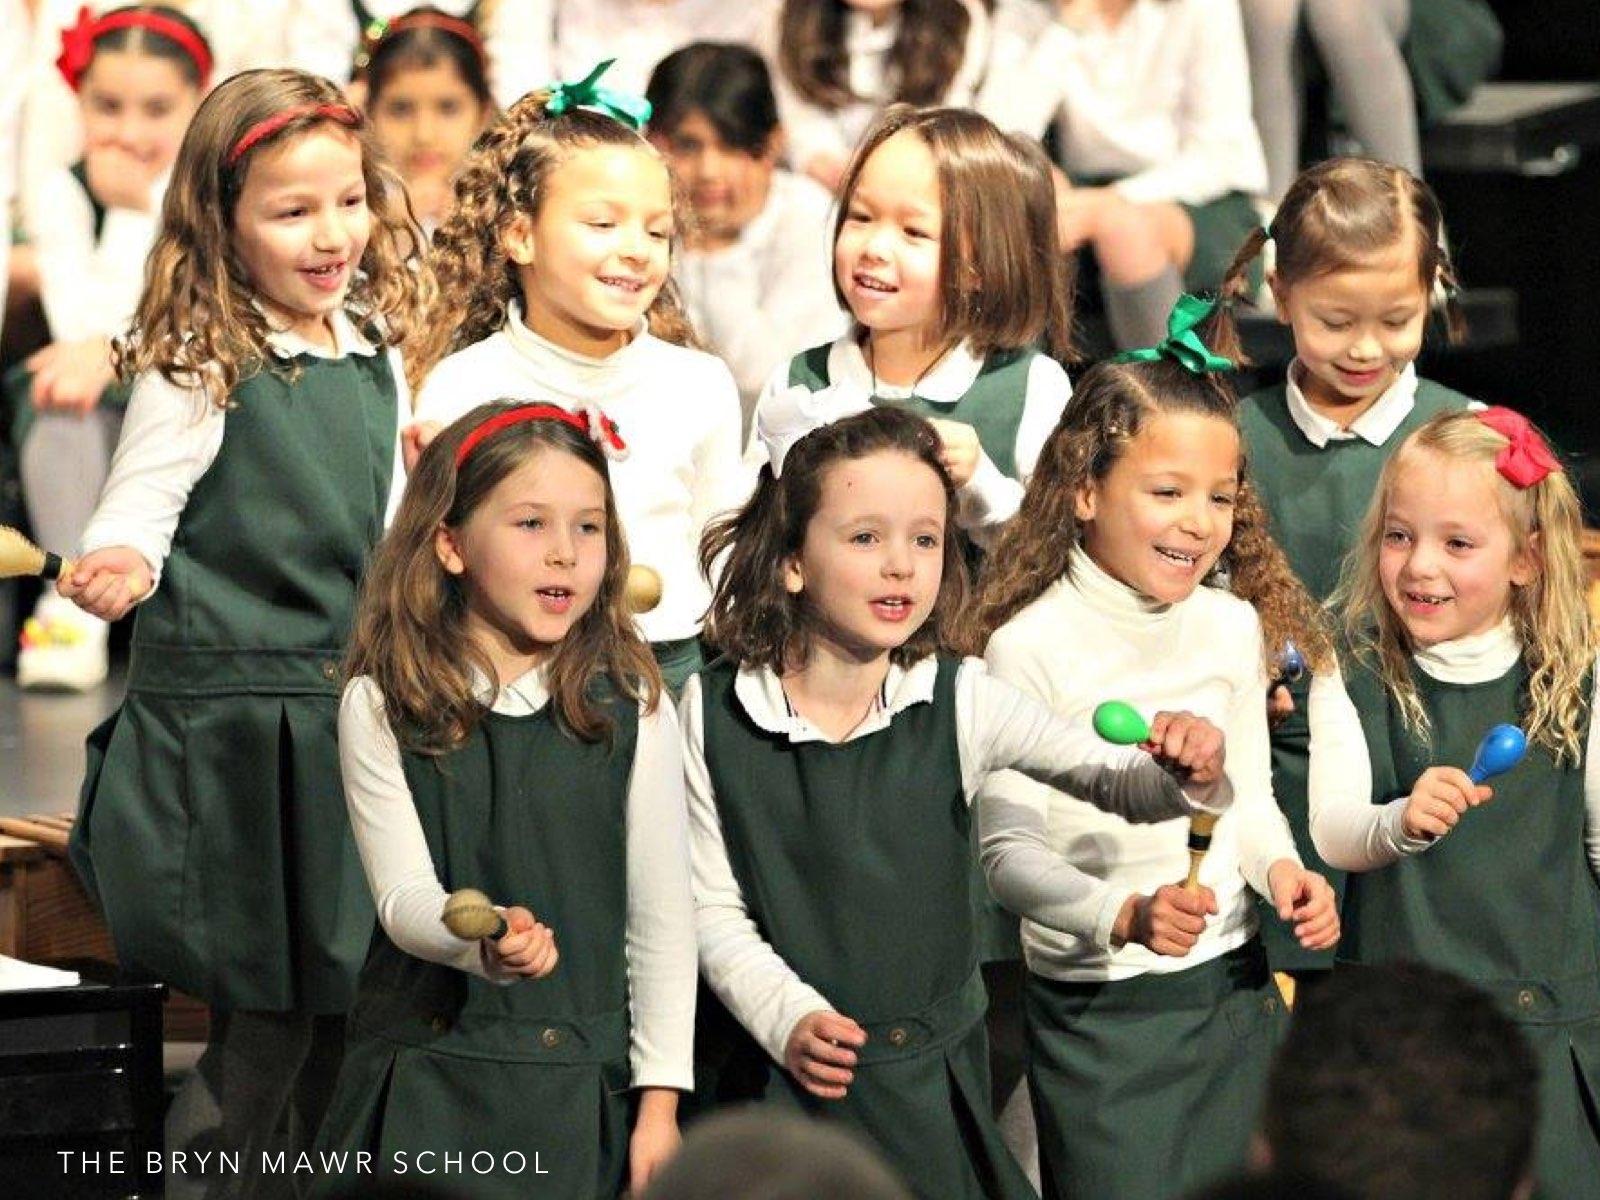 s(cool) stories the bryn mawr school